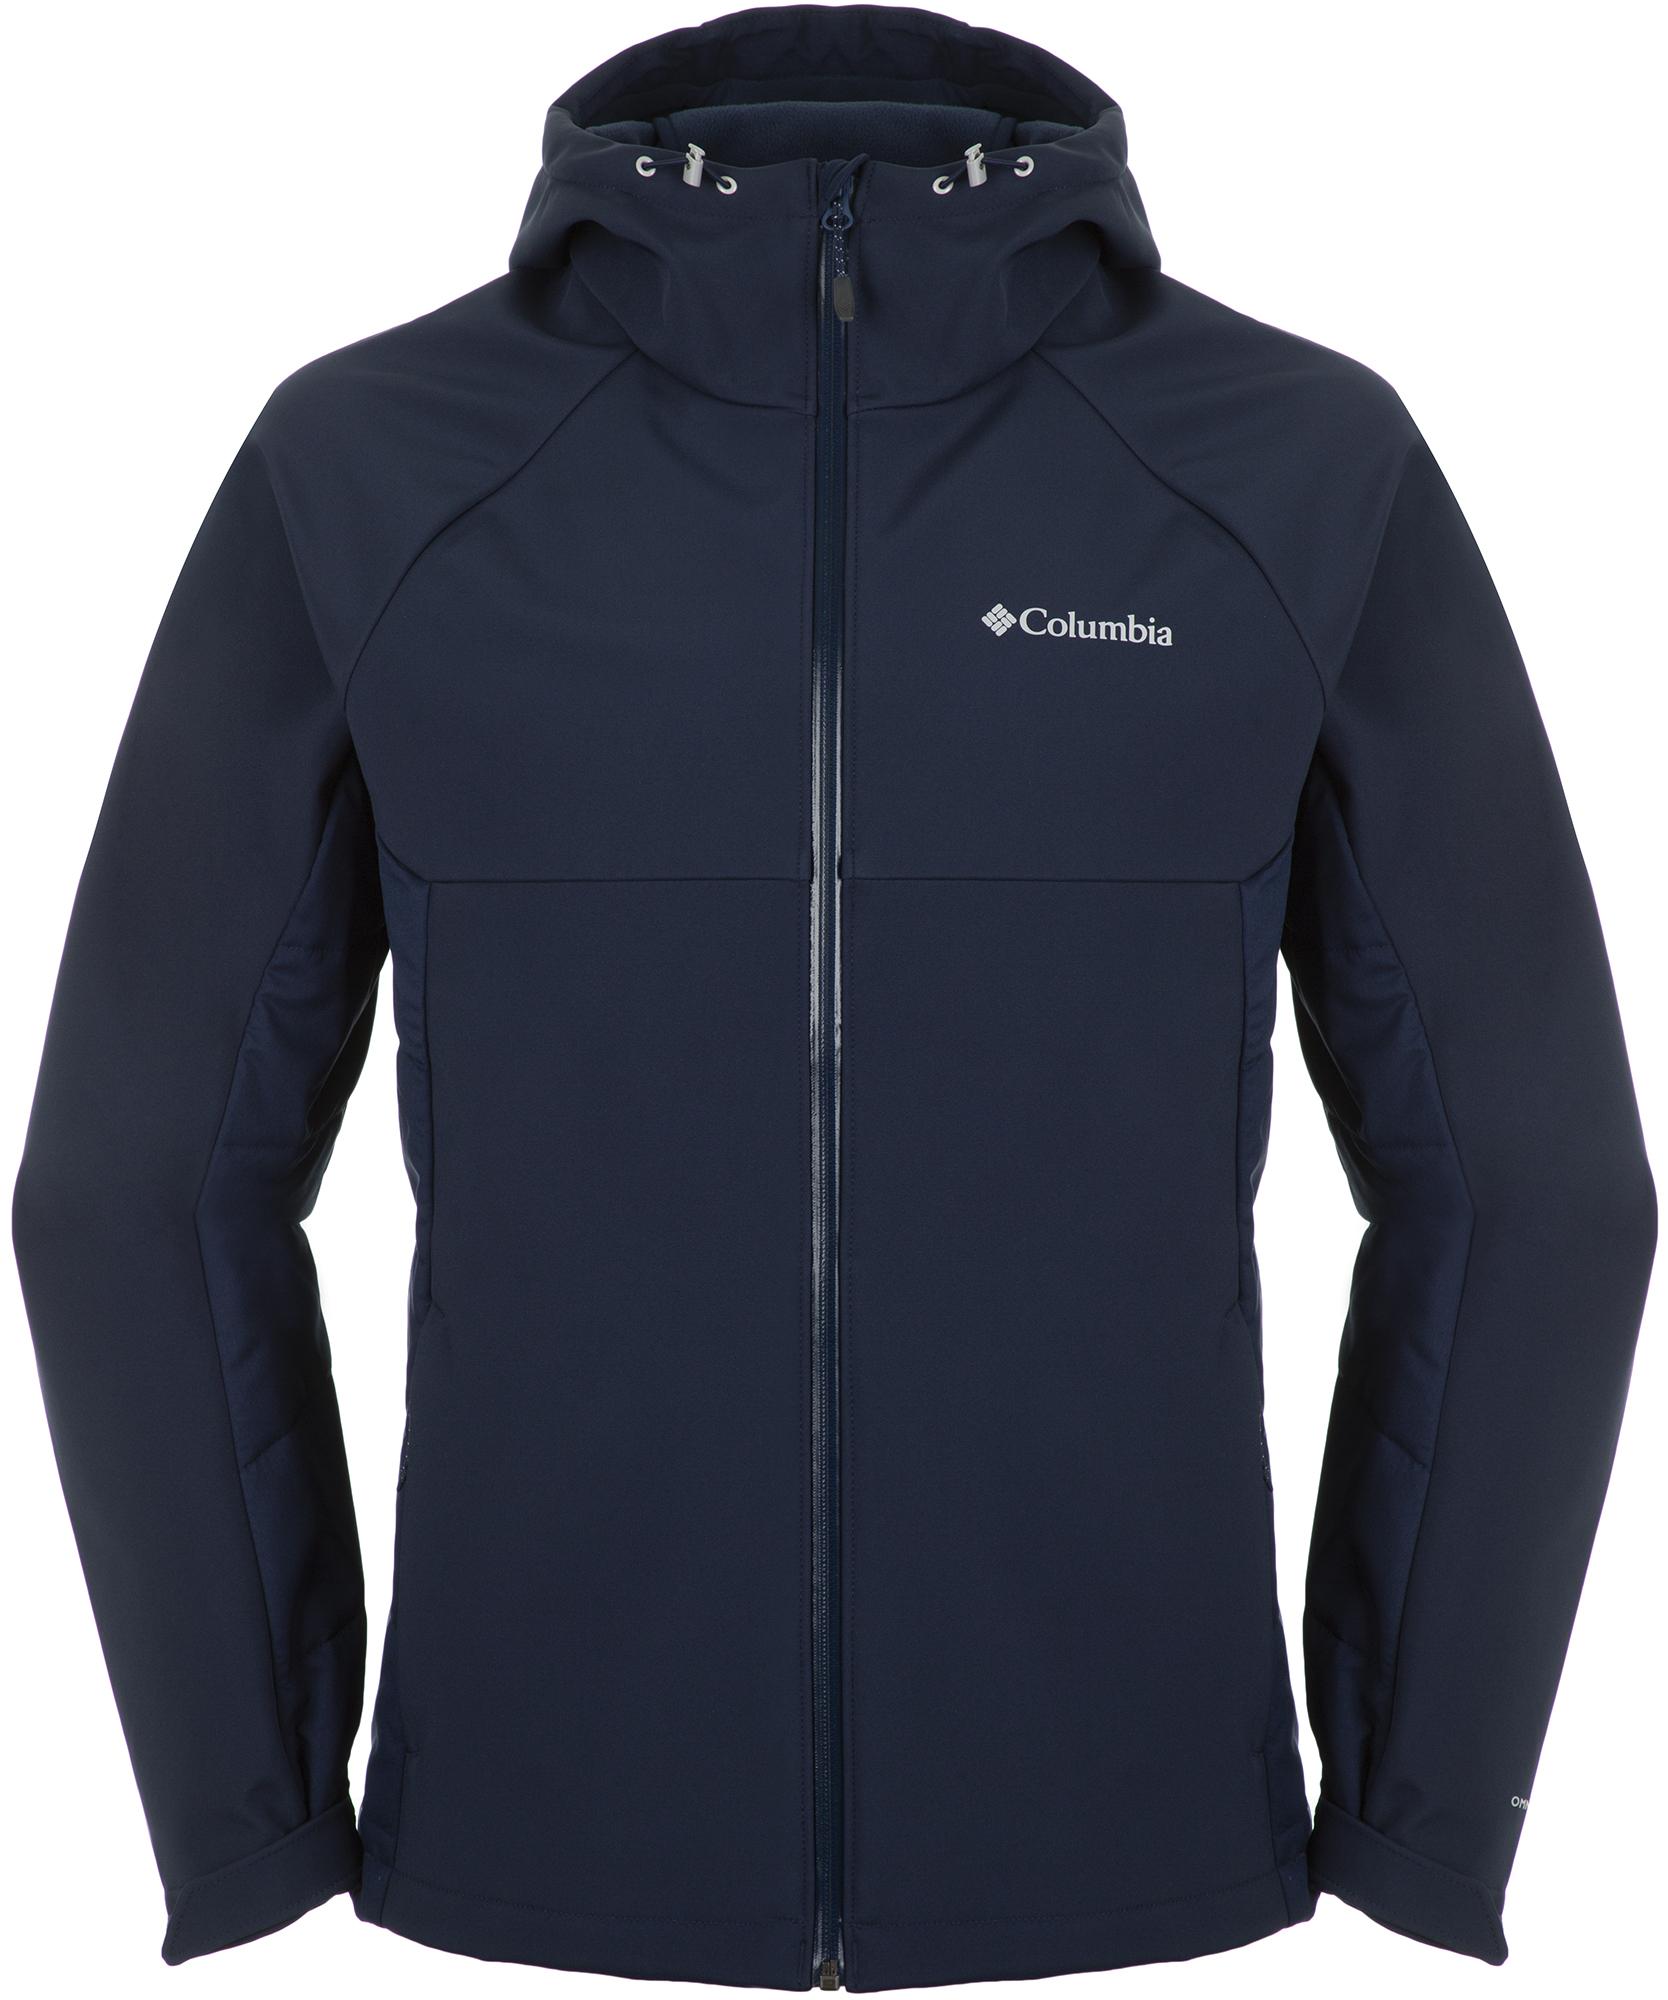 Columbia Куртка утепленная мужская Columbia Baltic Point, размер 56 цена и фото